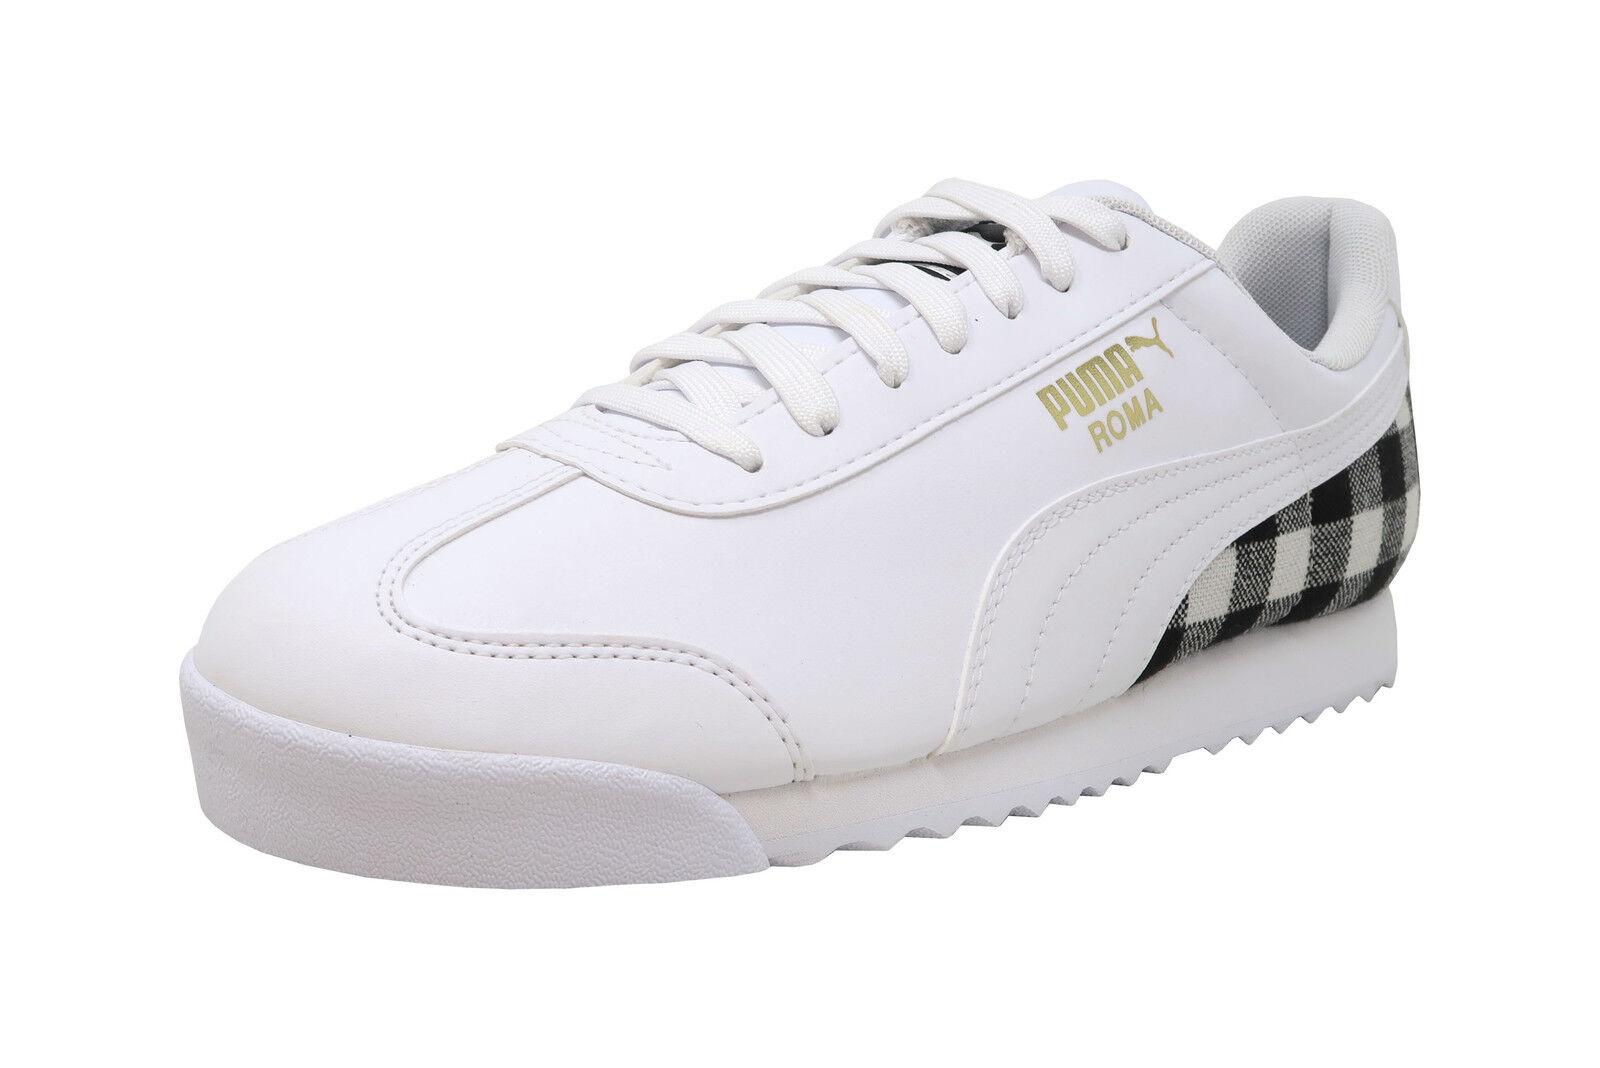 PUMA Roma LTHR Flannel White Black Plaid Lace Up Sneaker Adult Fashion Men shoes